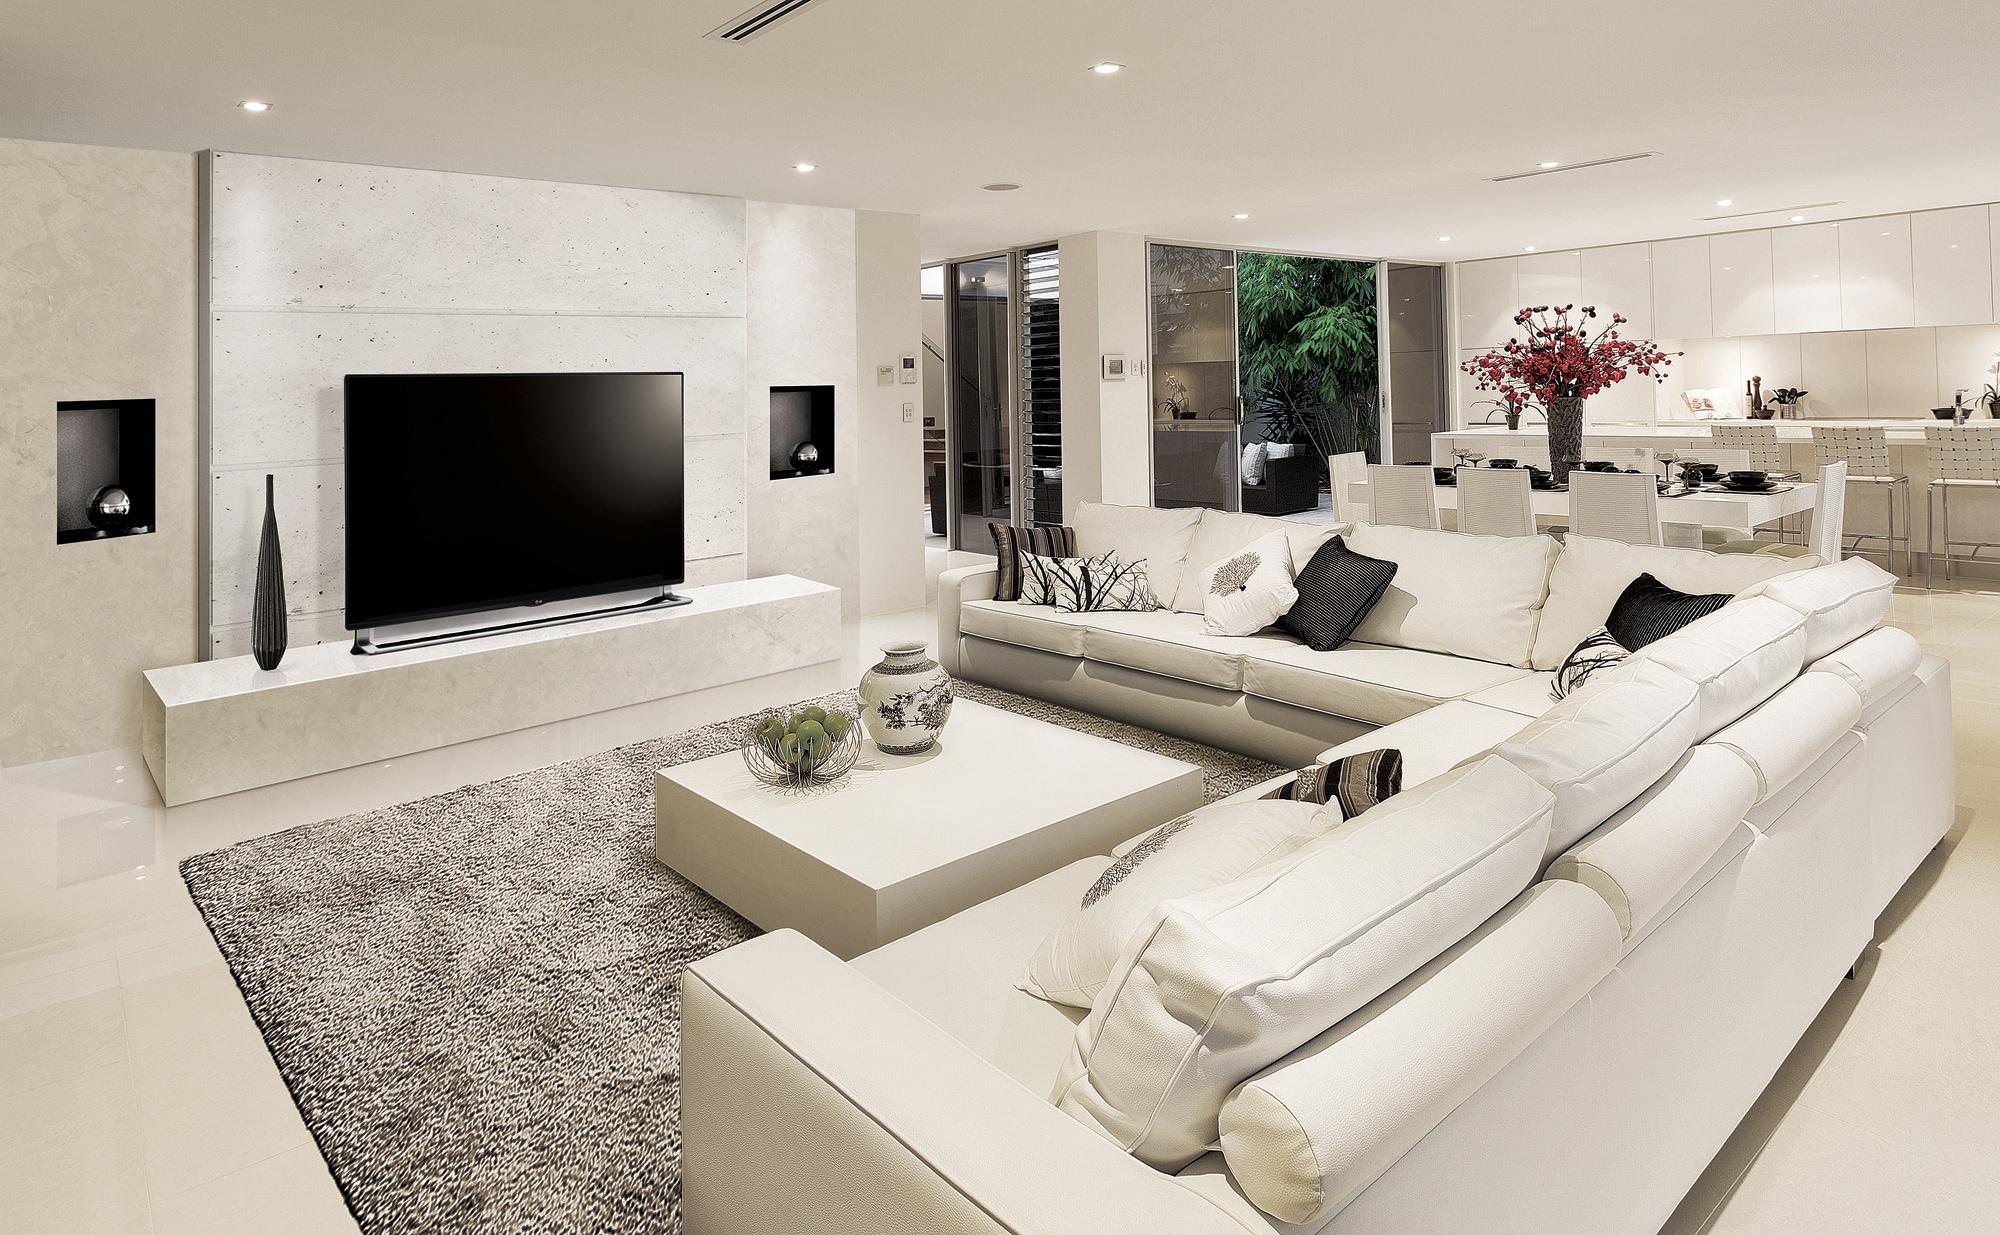 Inch Tv In Living Room